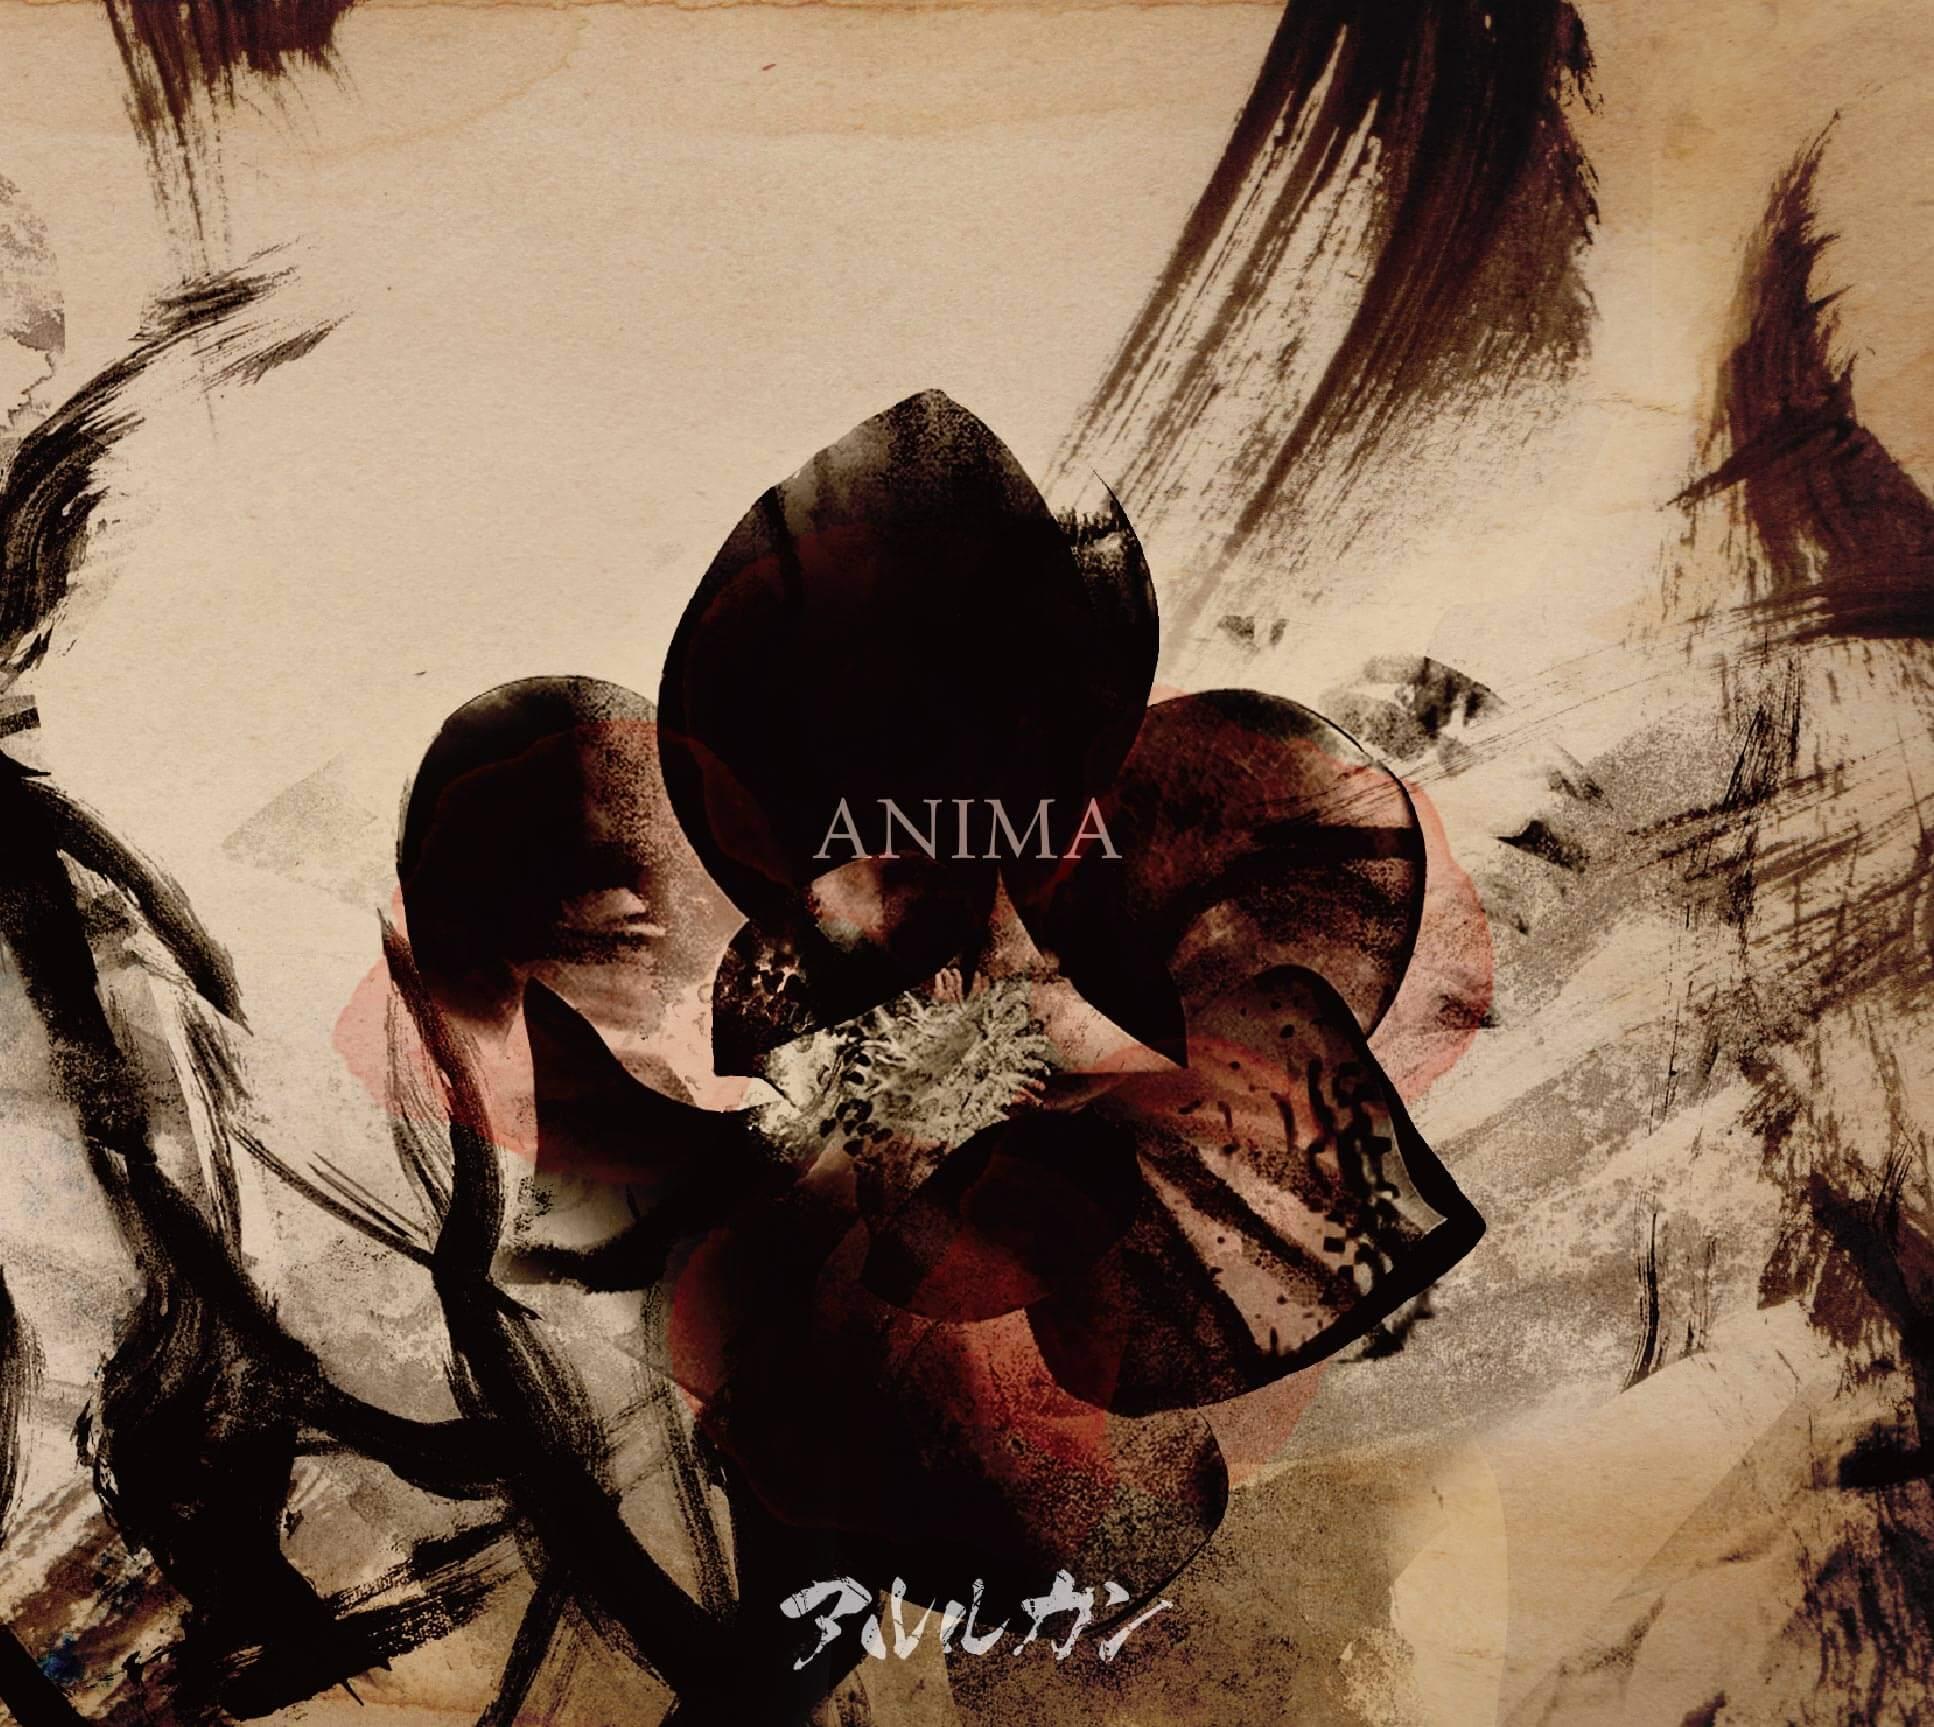 「ANIMA」【初回盤】